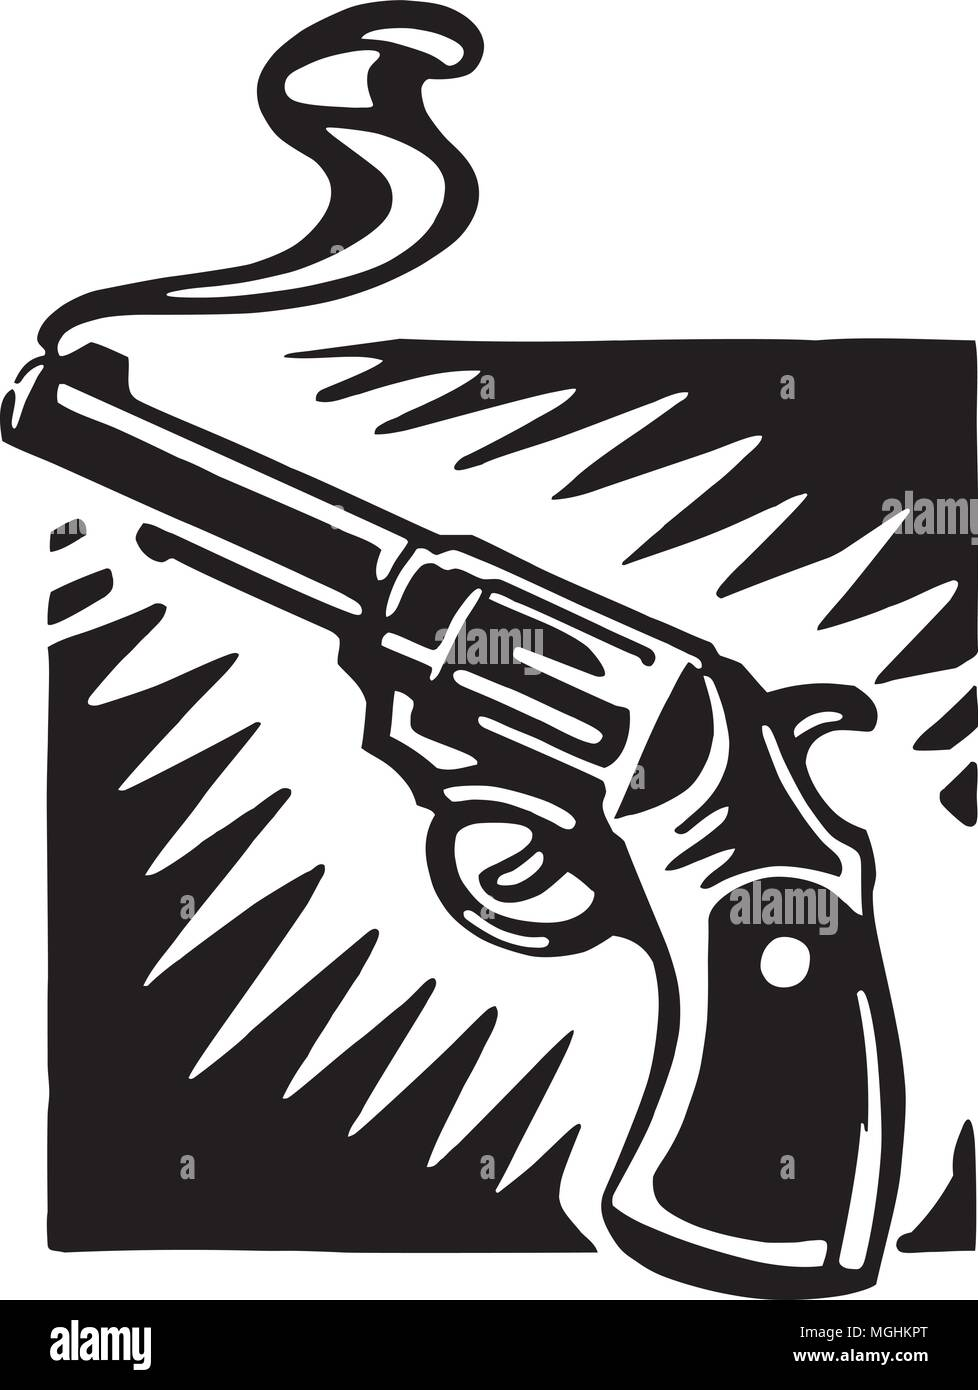 hight resolution of smoking gun retro ilustraci n clipart